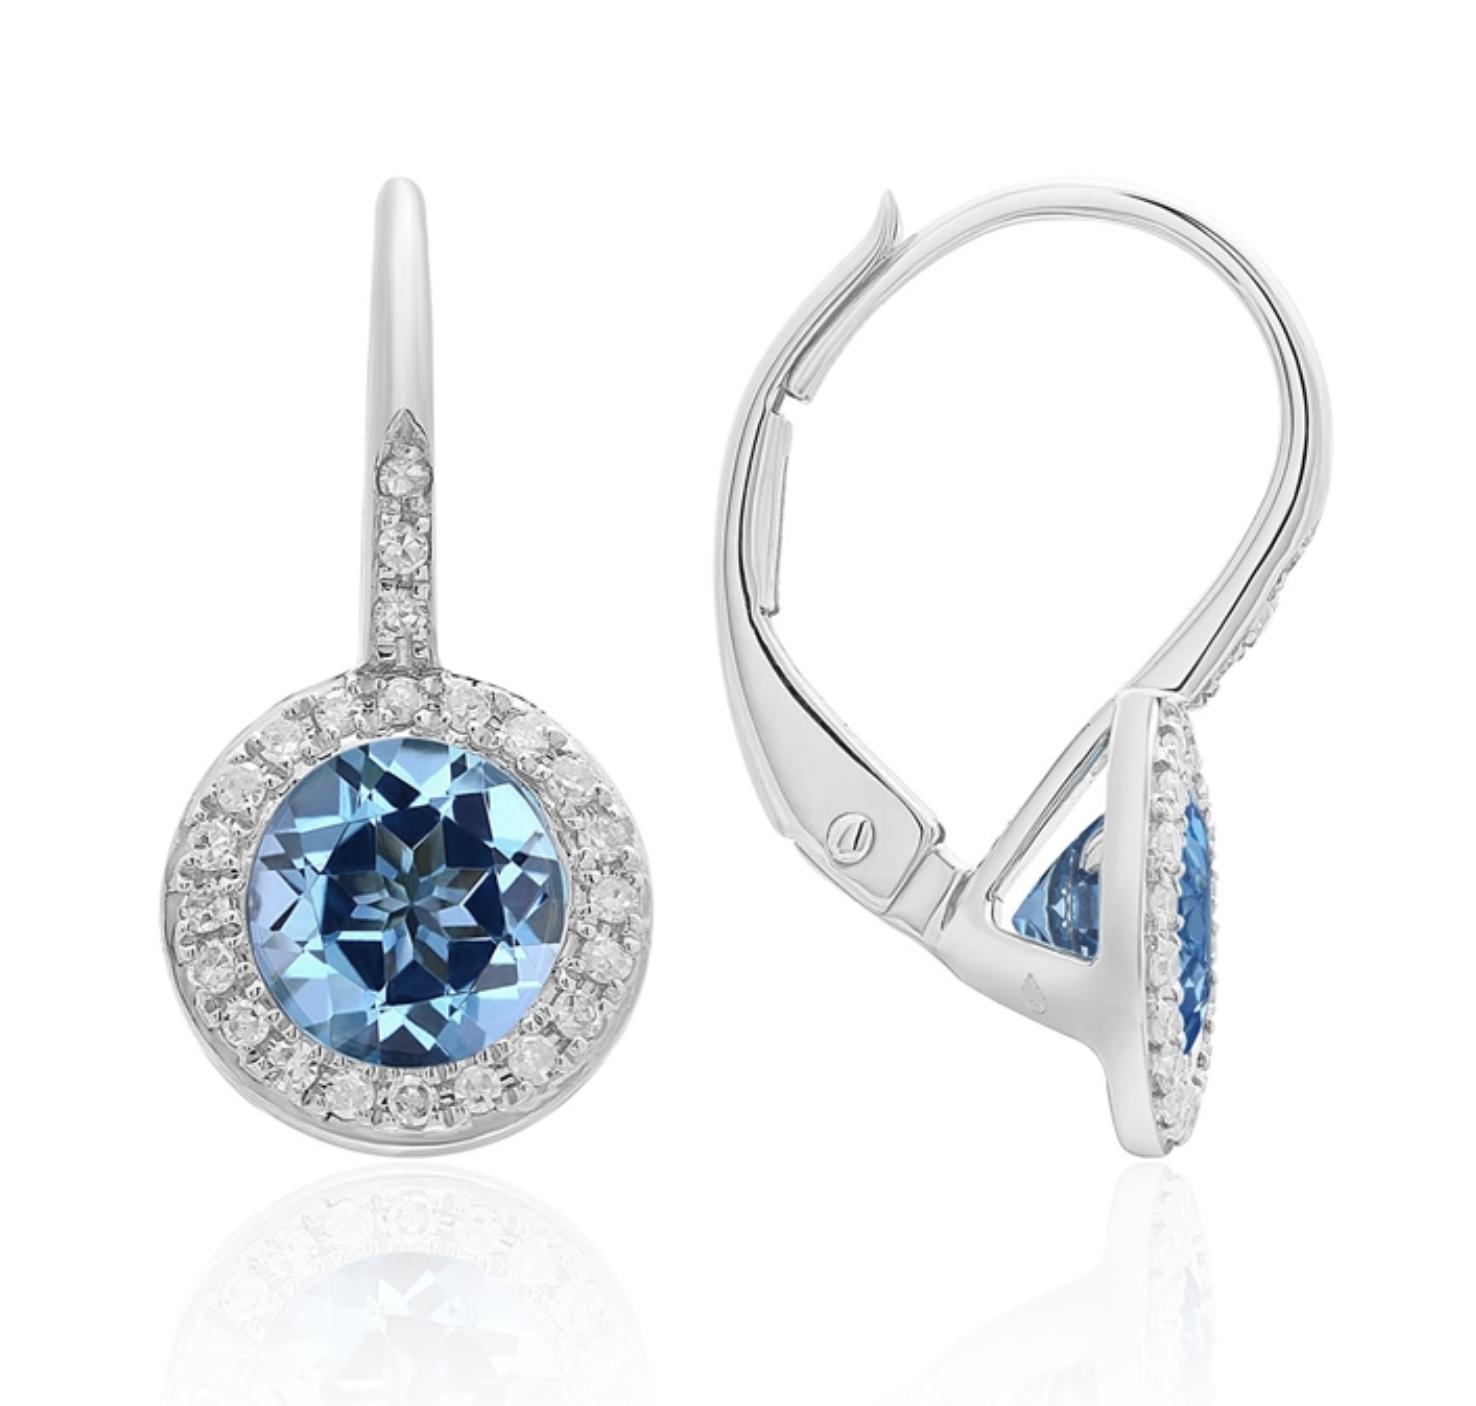 White Gold Diamond Pave & Blue Topaz Earrings